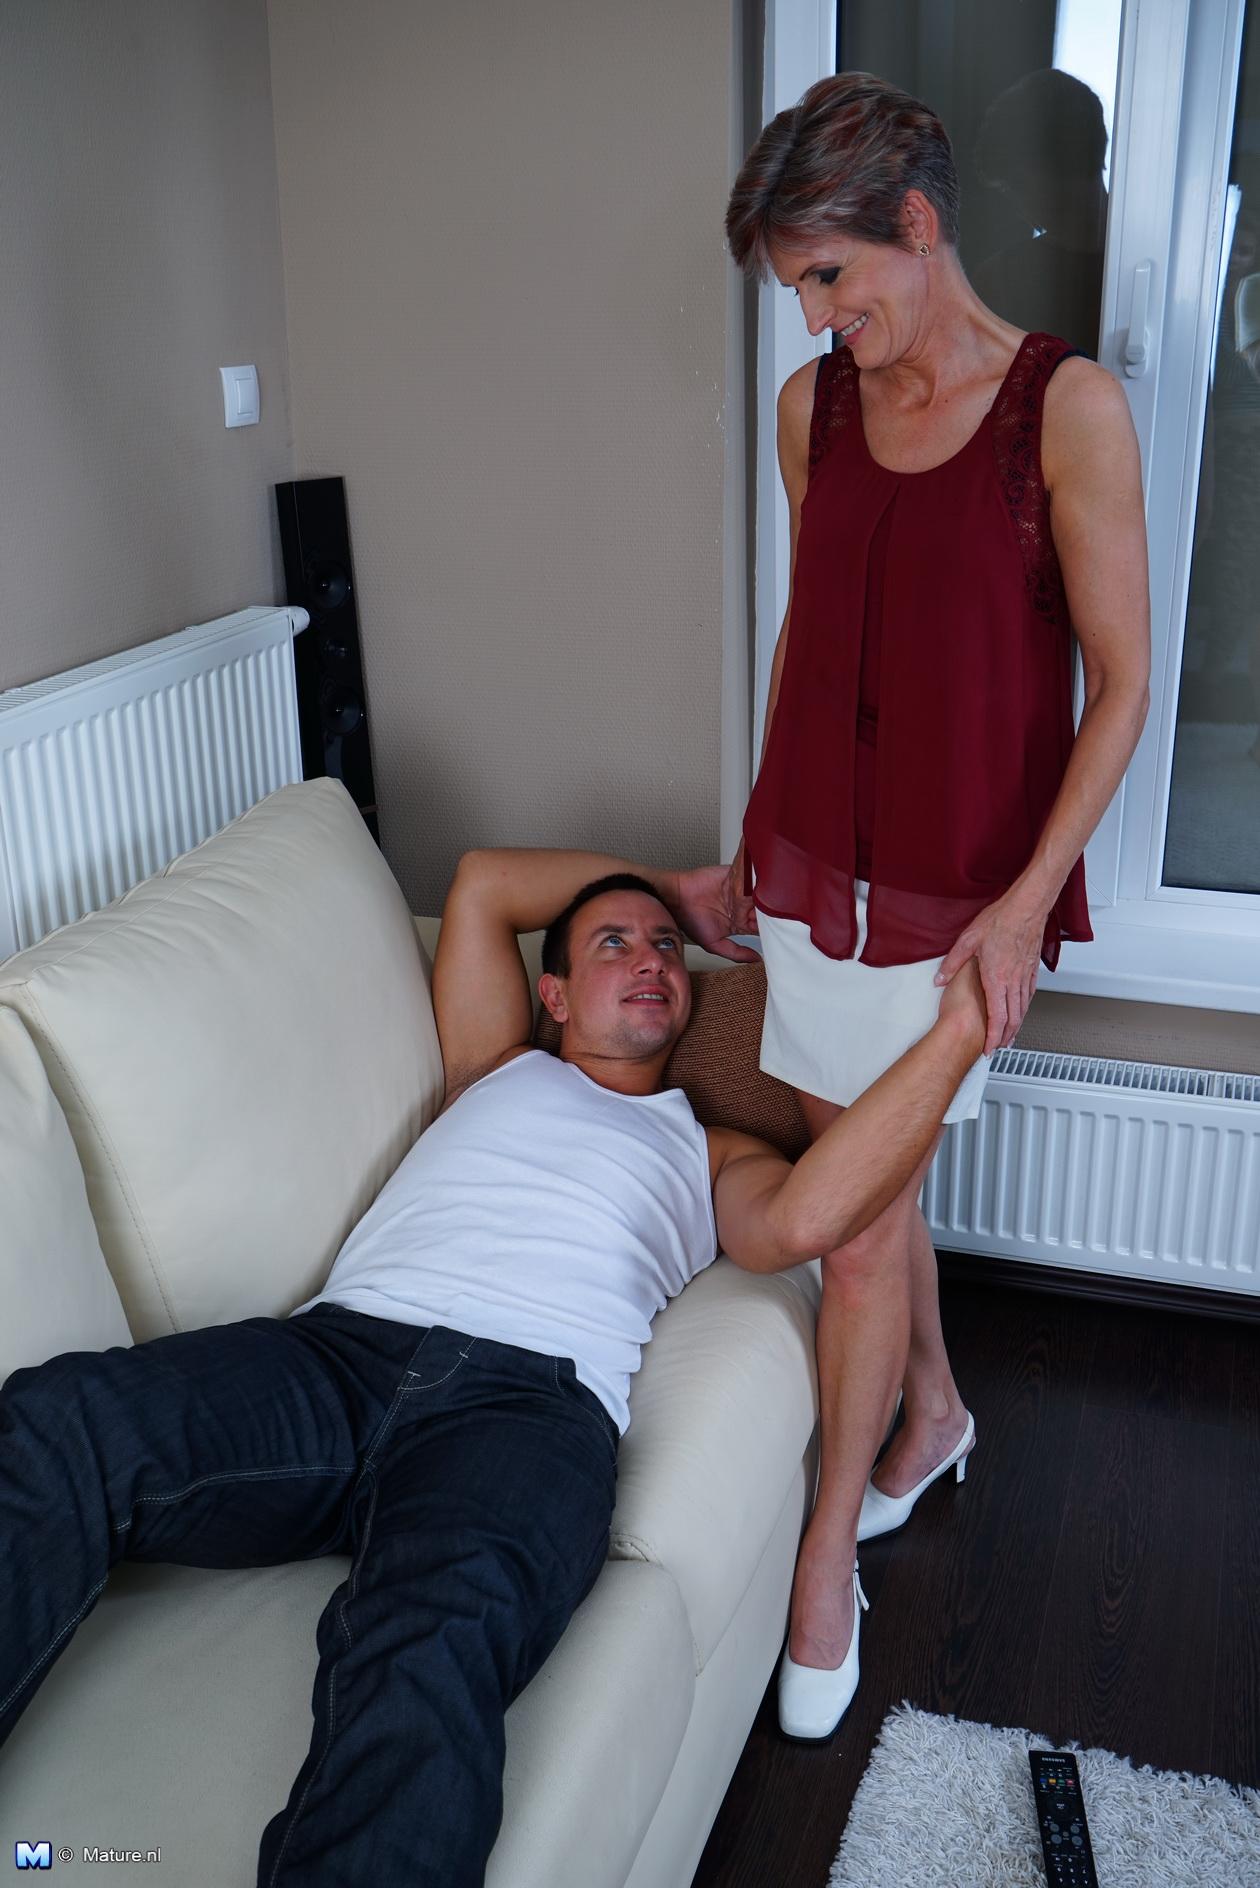 Man gives girl an orgasm